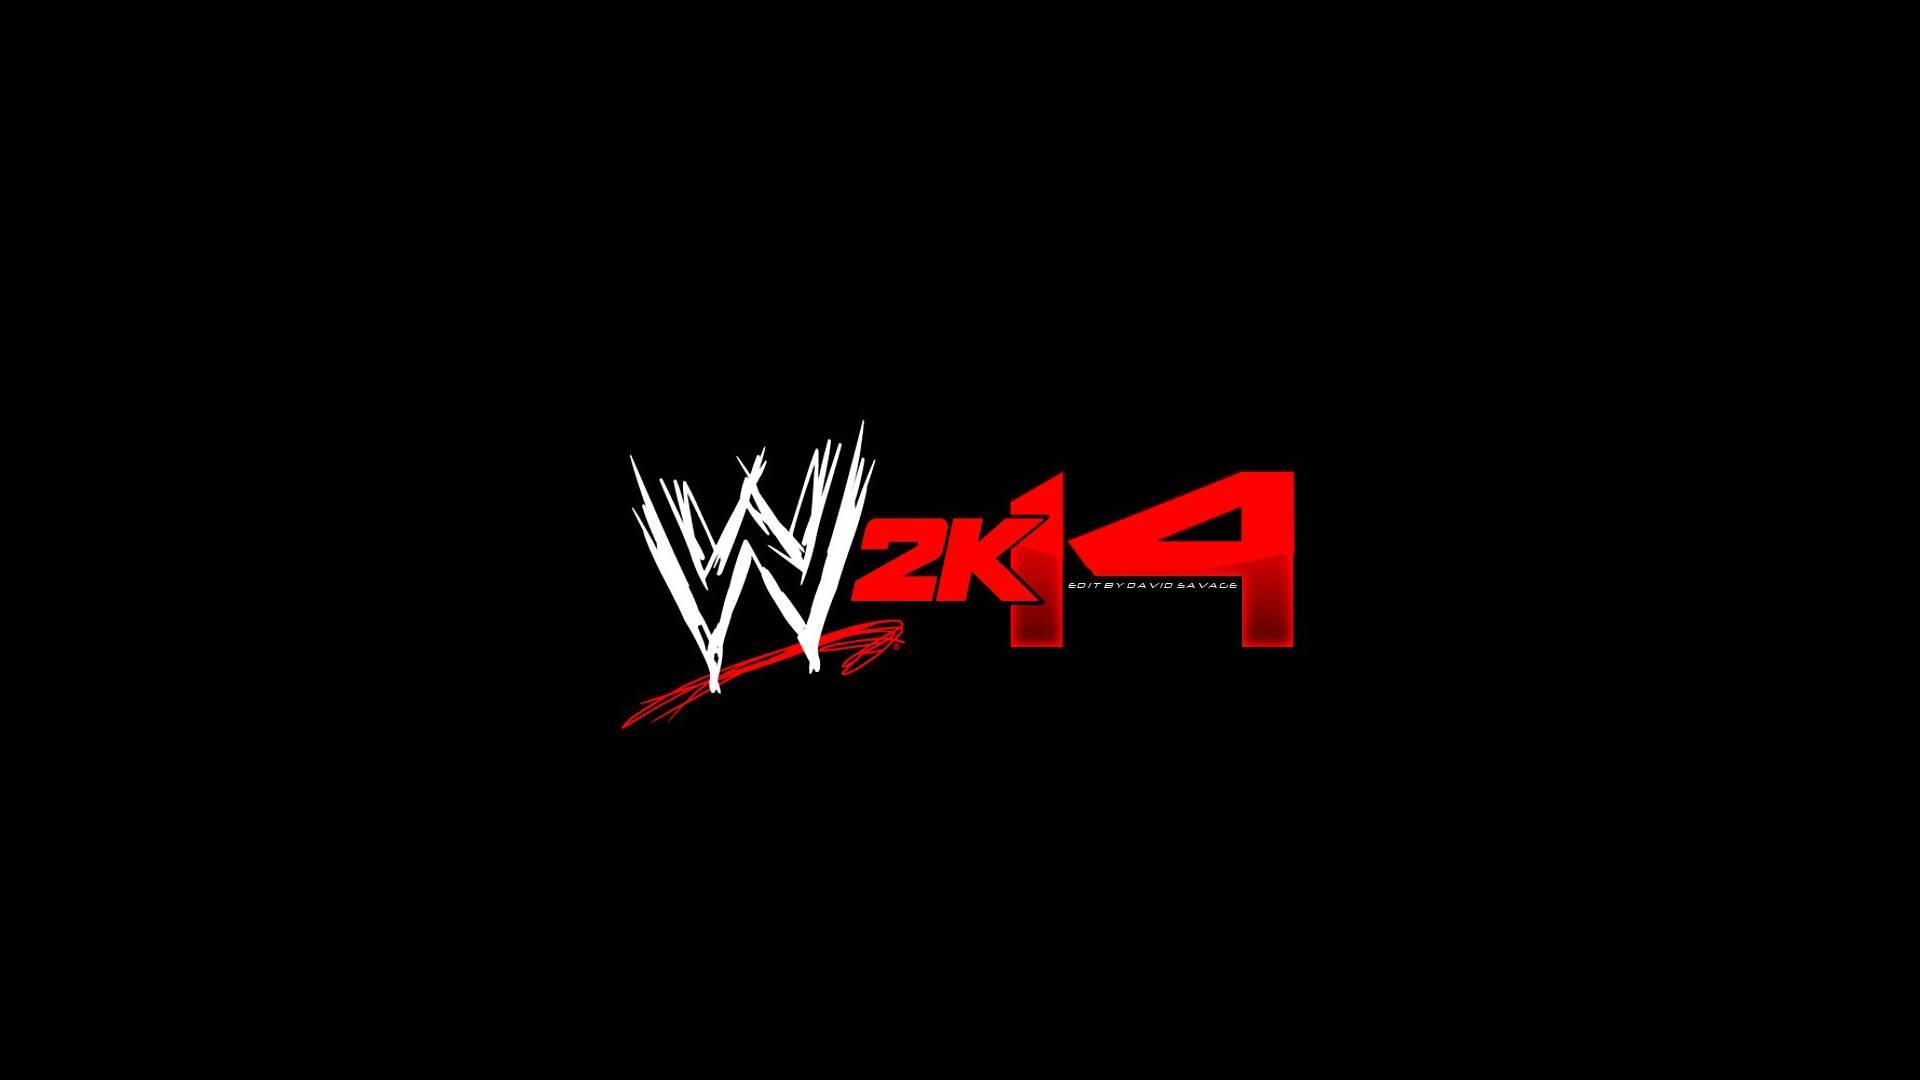 WWE Logo Wallpapers 1920x1080